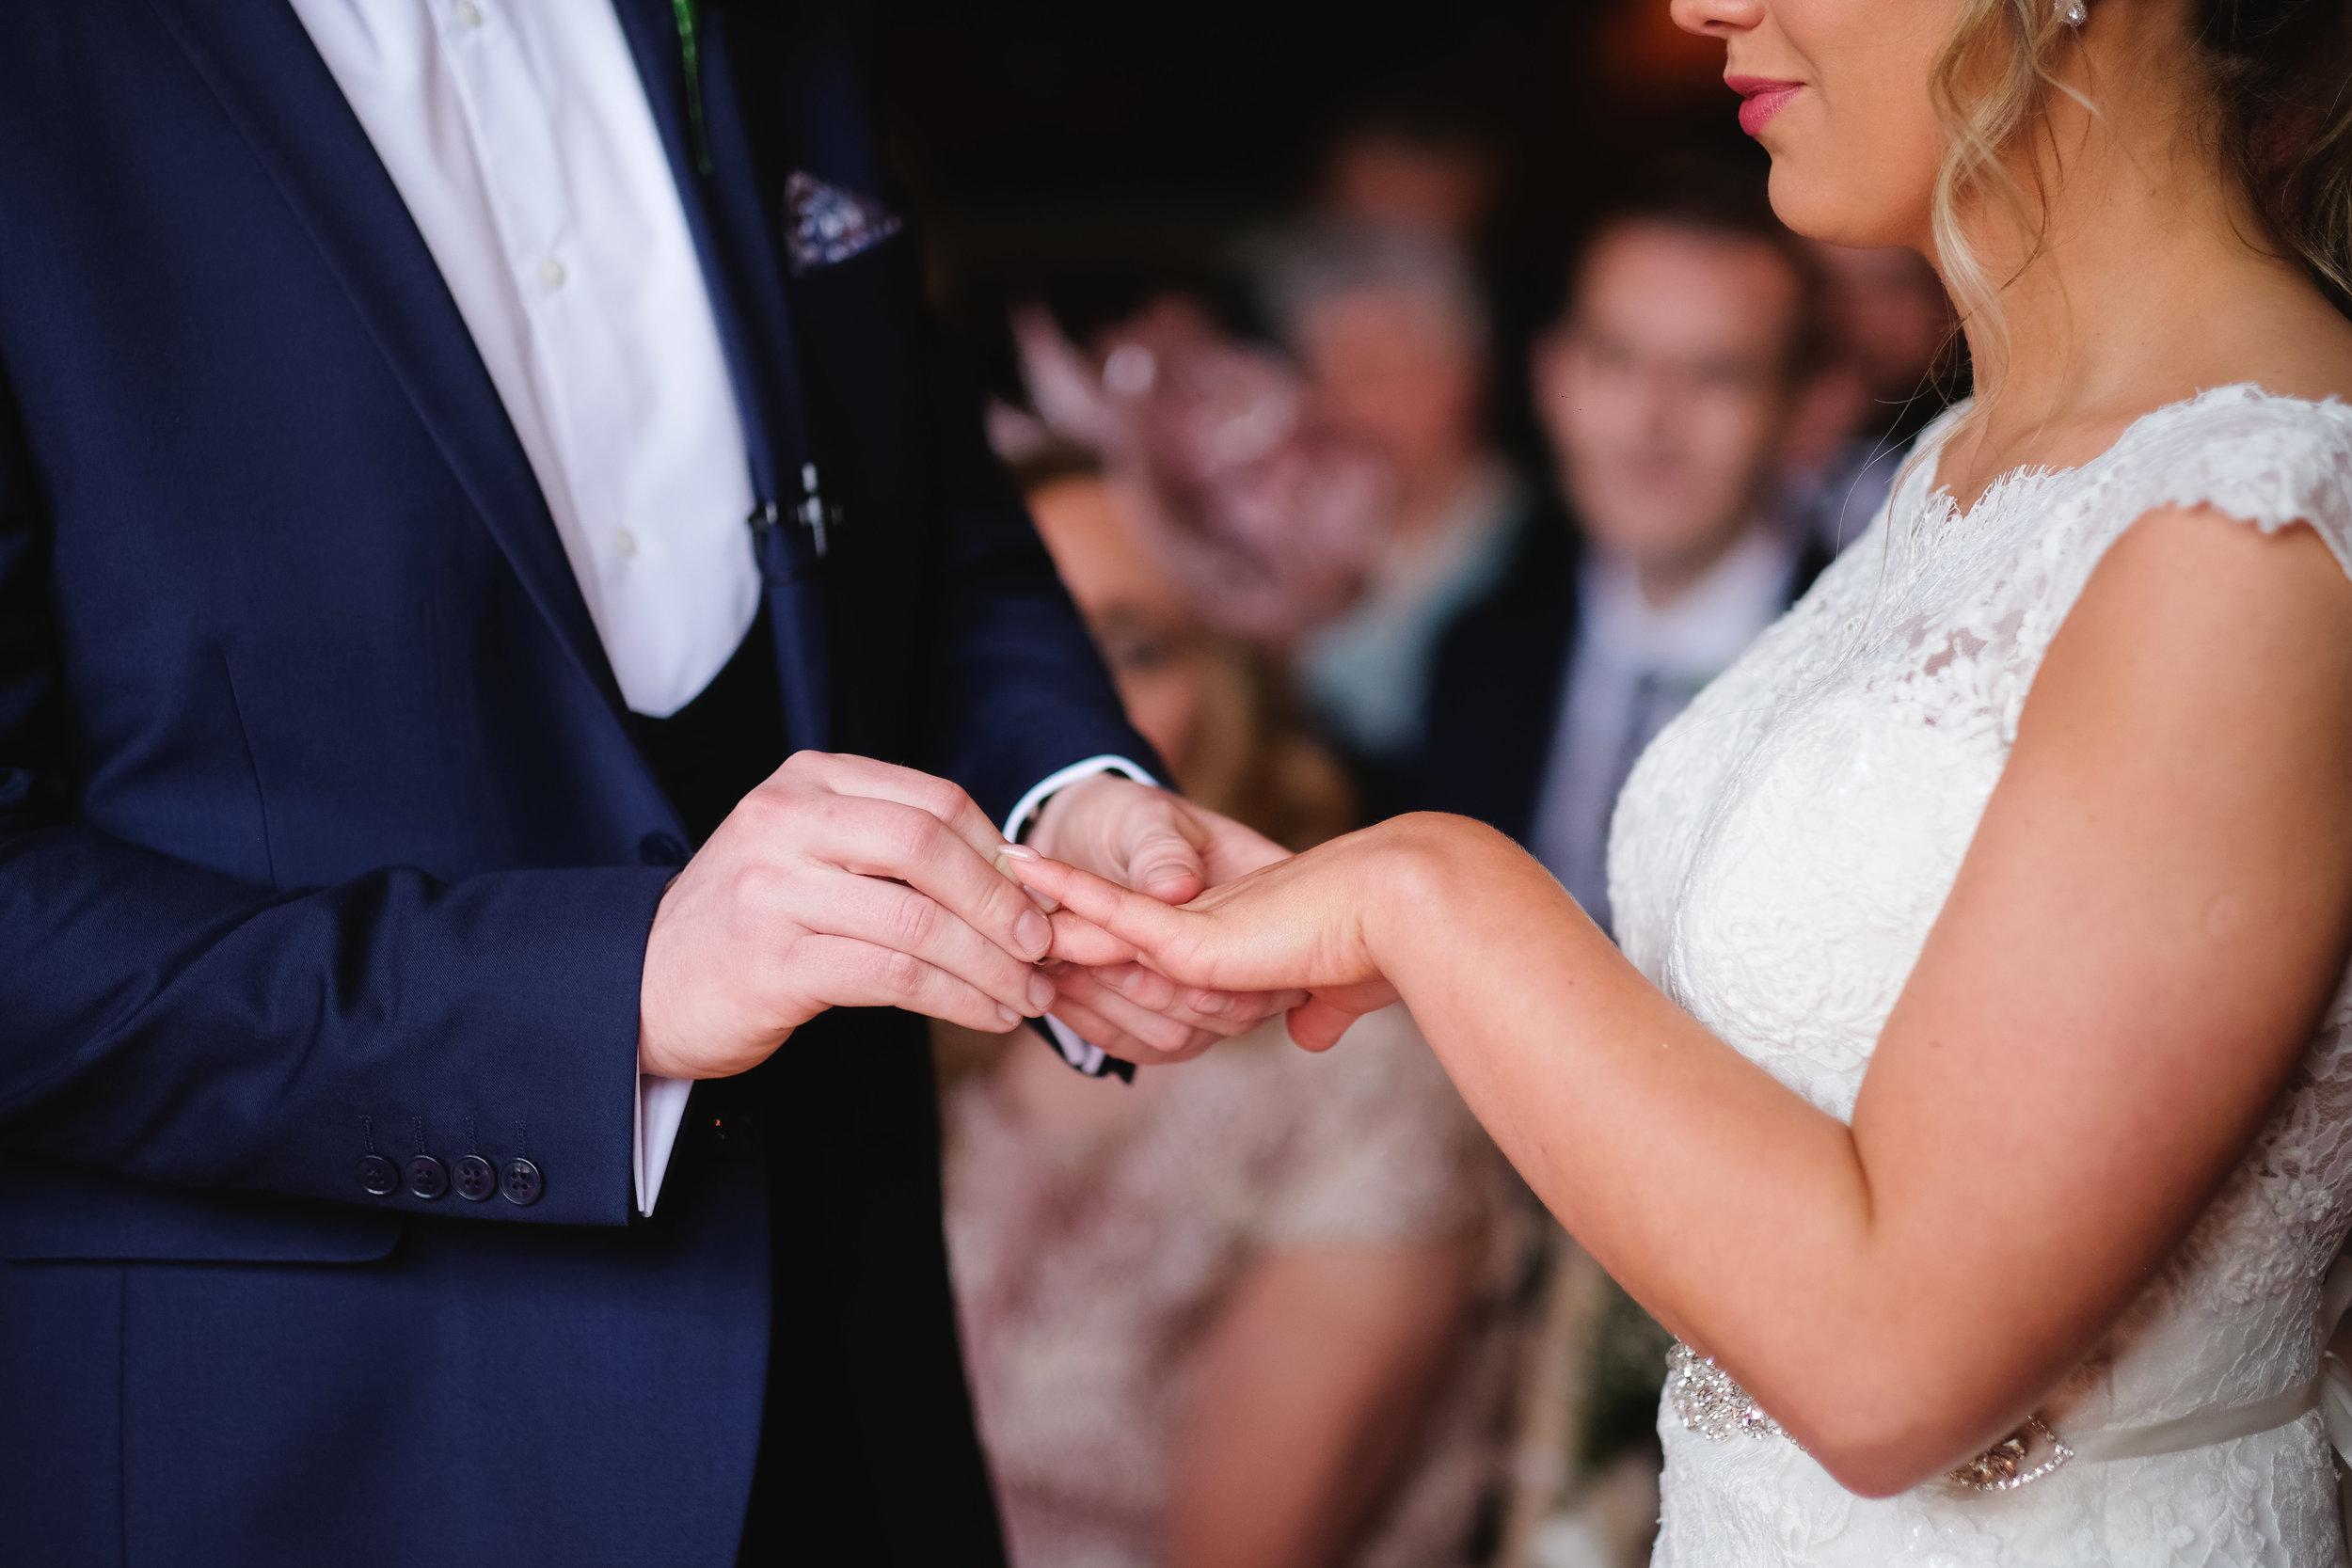 Thornton manor wedding photography cheshire wedding photographer liverpool manchester warrington chester wirral wedding BLOG (41 of 108).jpg